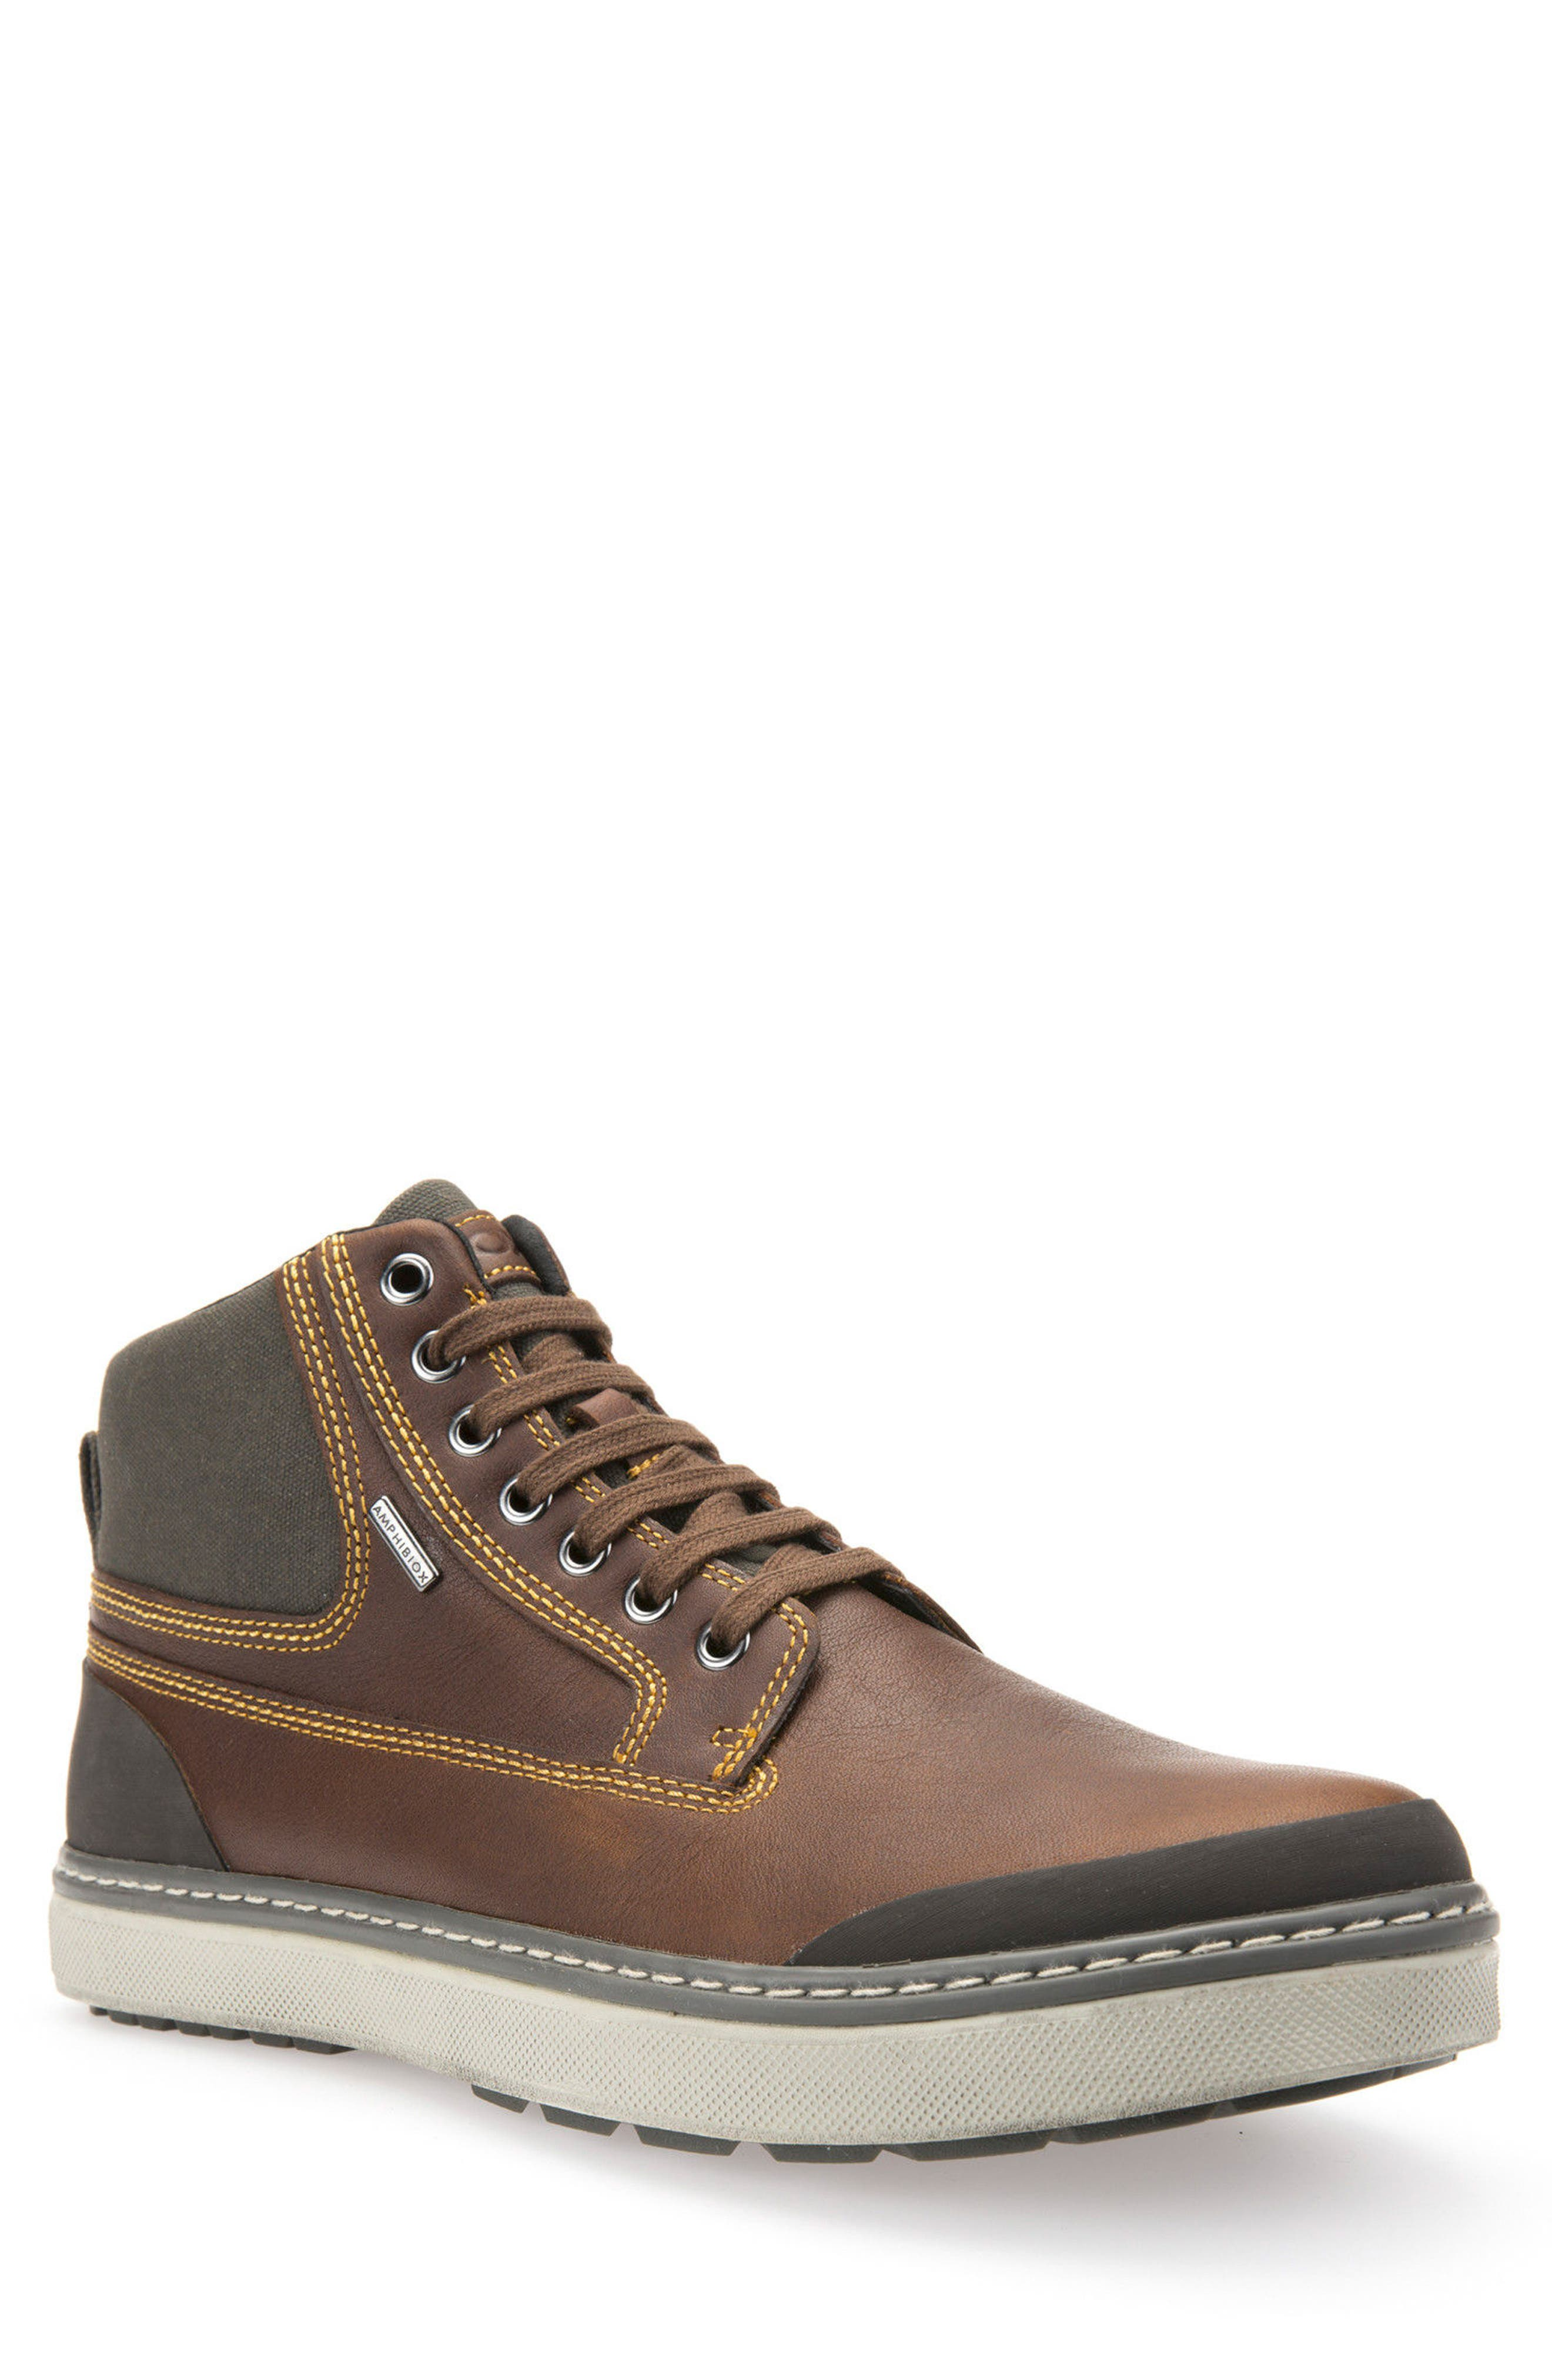 Mattias Amphibiox Waterproof Leather Sneaker,                             Main thumbnail 1, color,                             Brown/ Brown